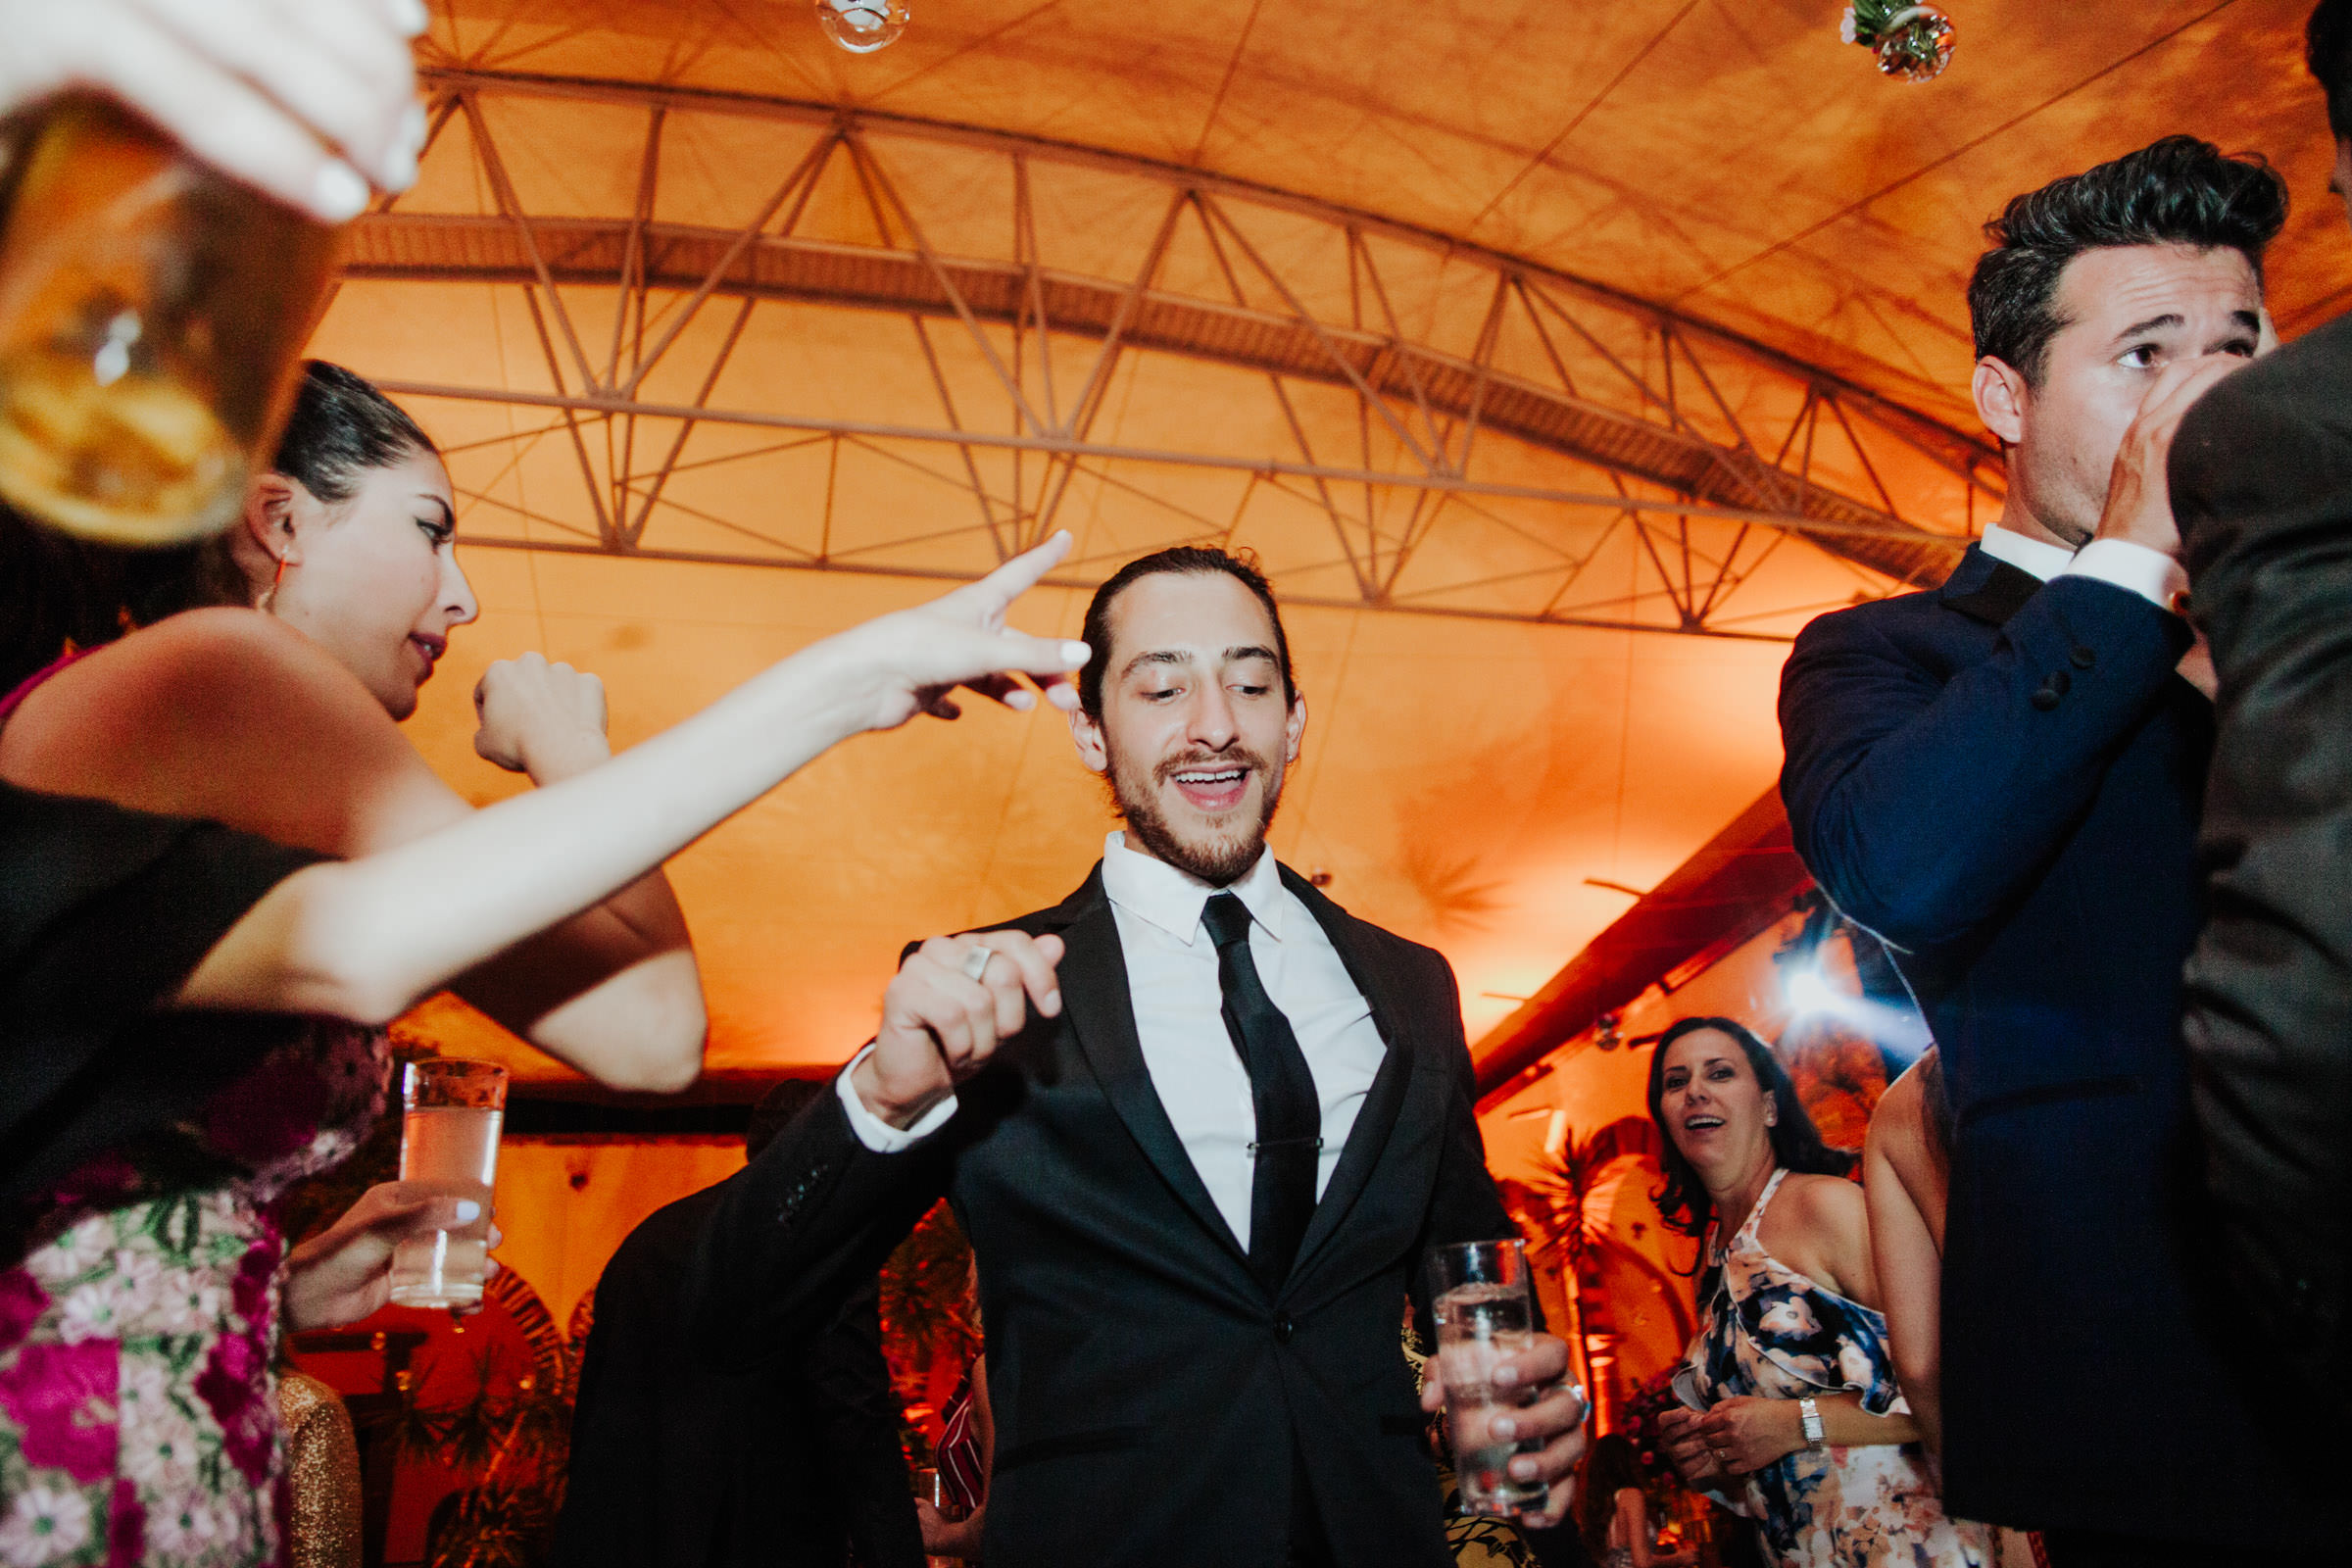 San-Miguel-de-Allende-Wedding-Photography-Parroquia-Instituto-Boda-Fotografia-Fer-Sergio-Pierce-Lifestyle-Photography0068.JPG